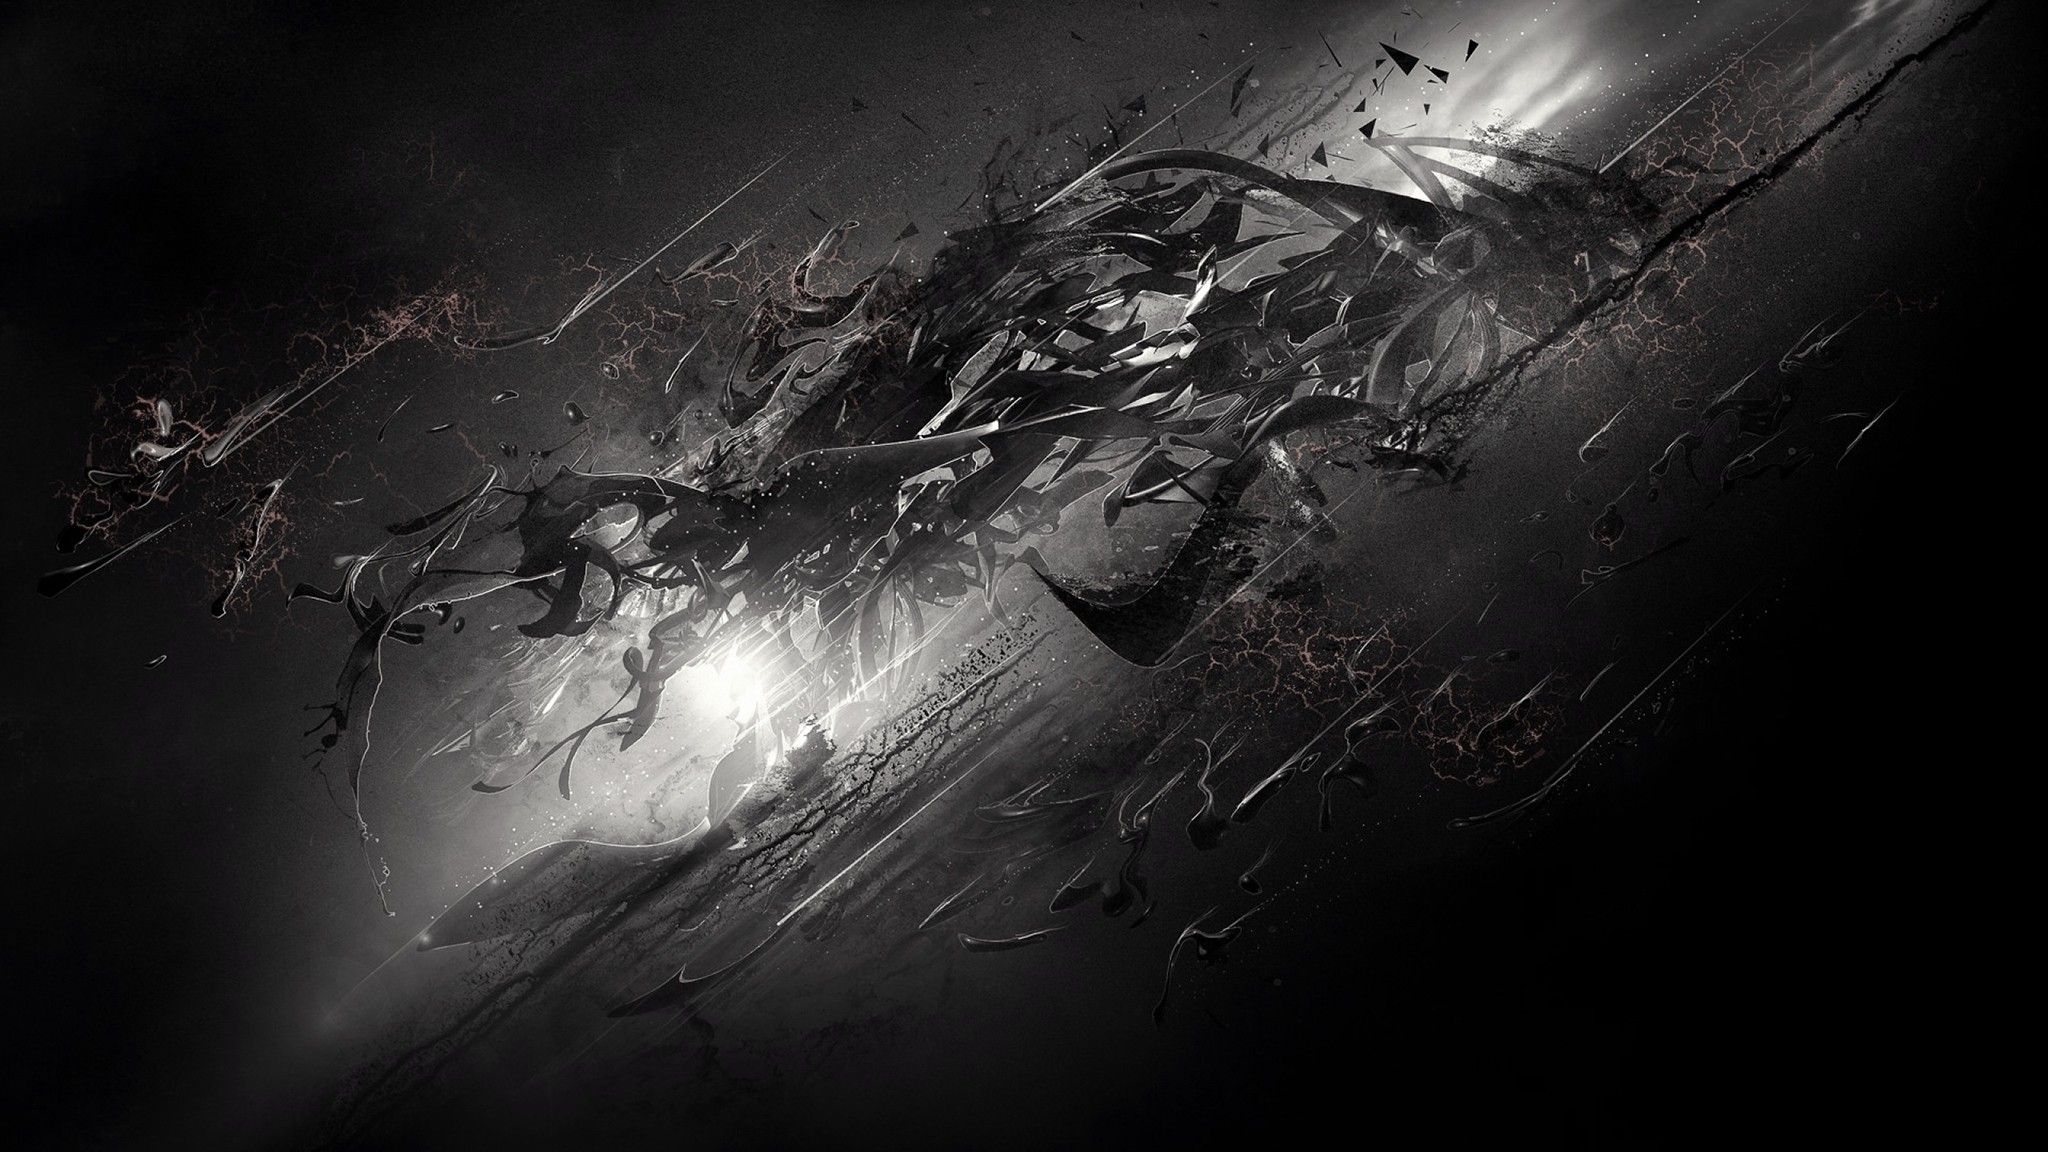 2048x1152 Abstract Dark Desktop Background. Download